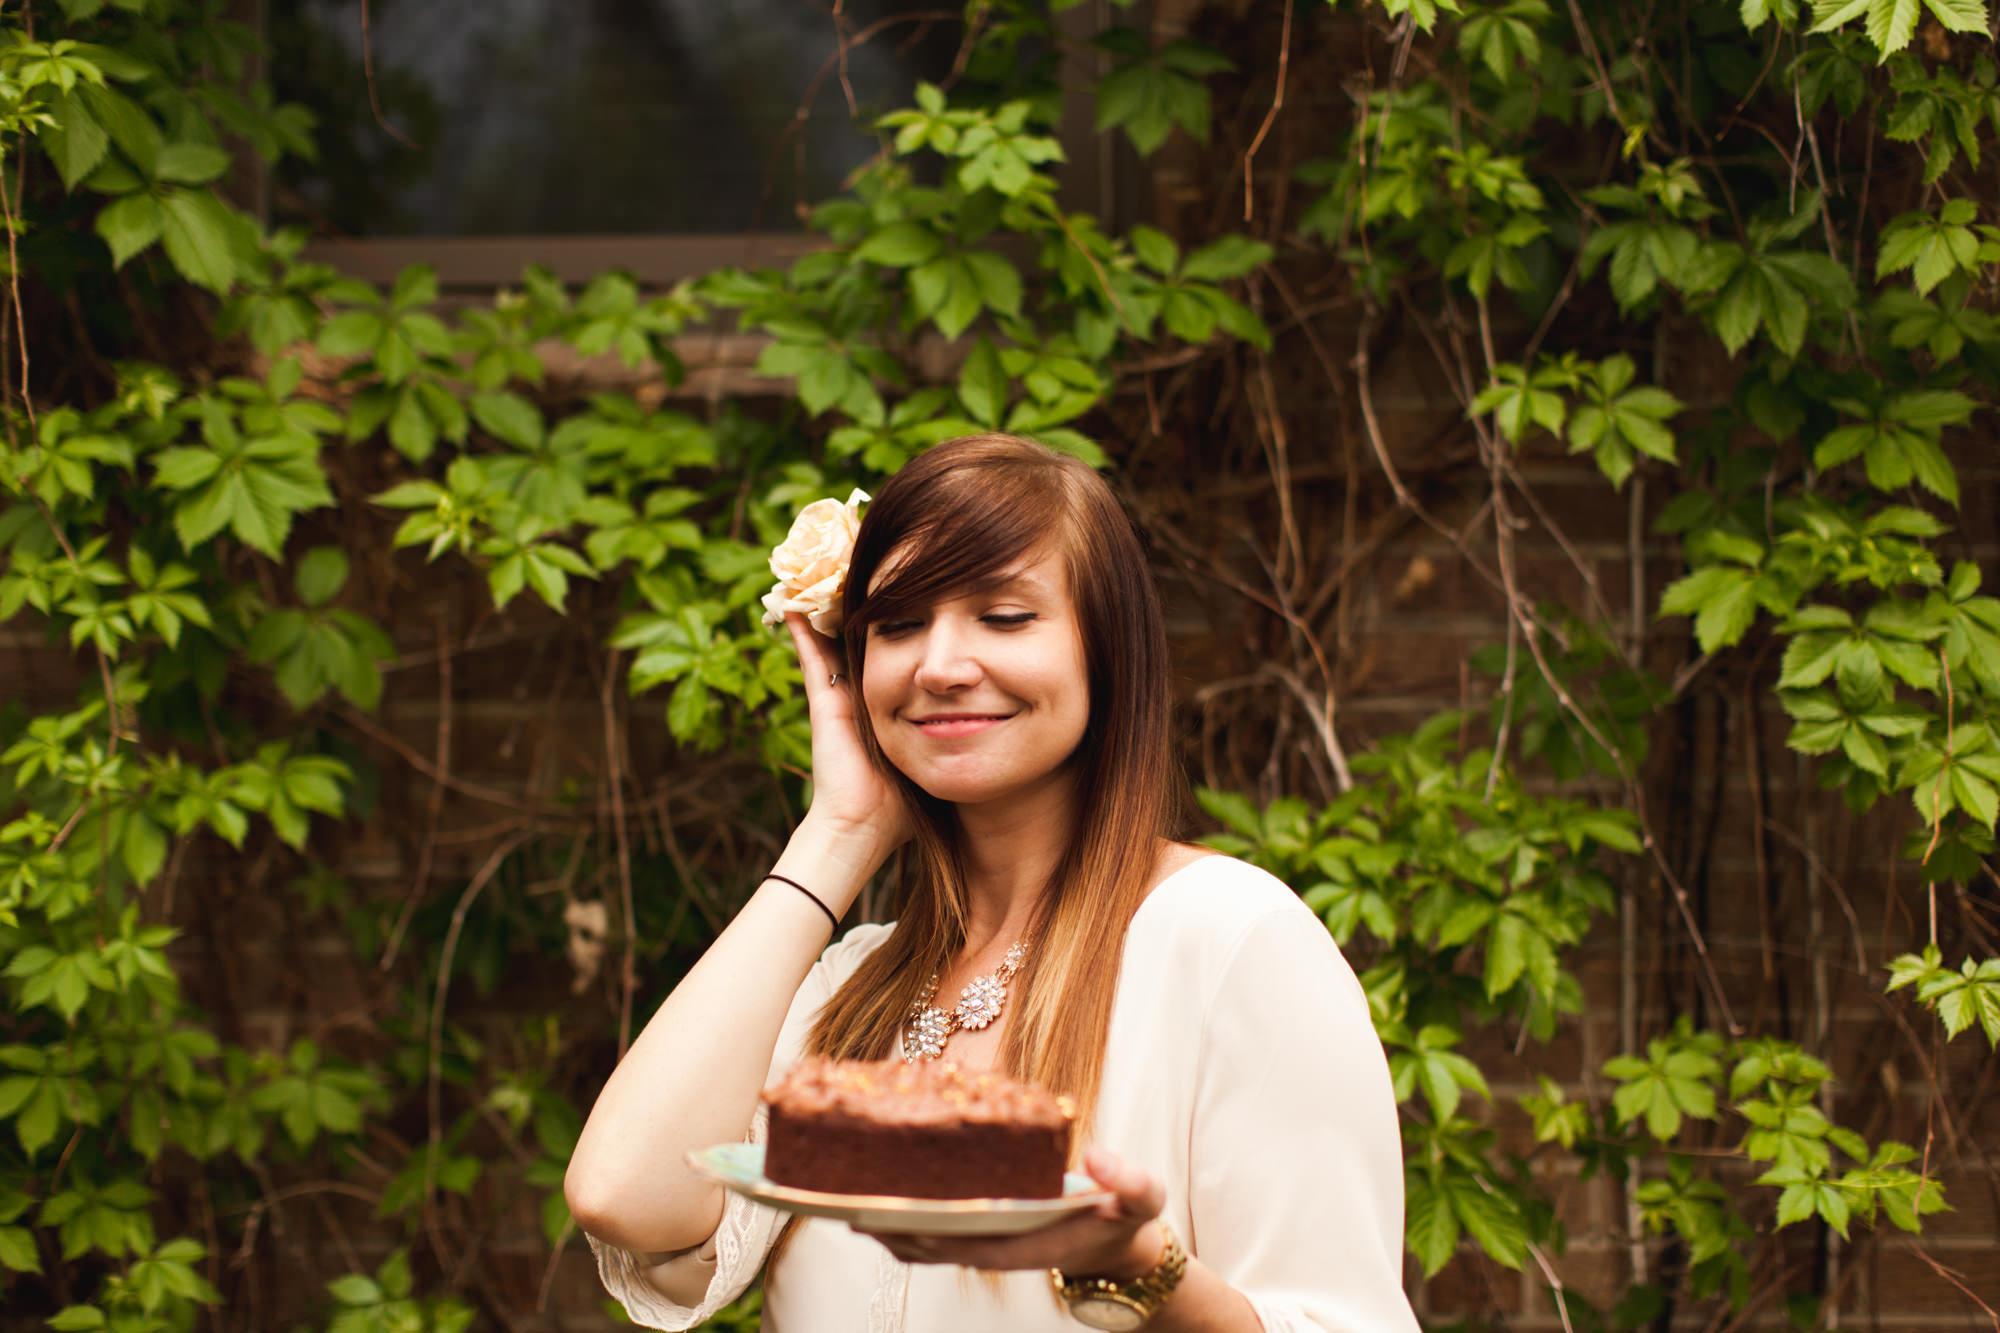 cake-recipe-denver-29.jpg